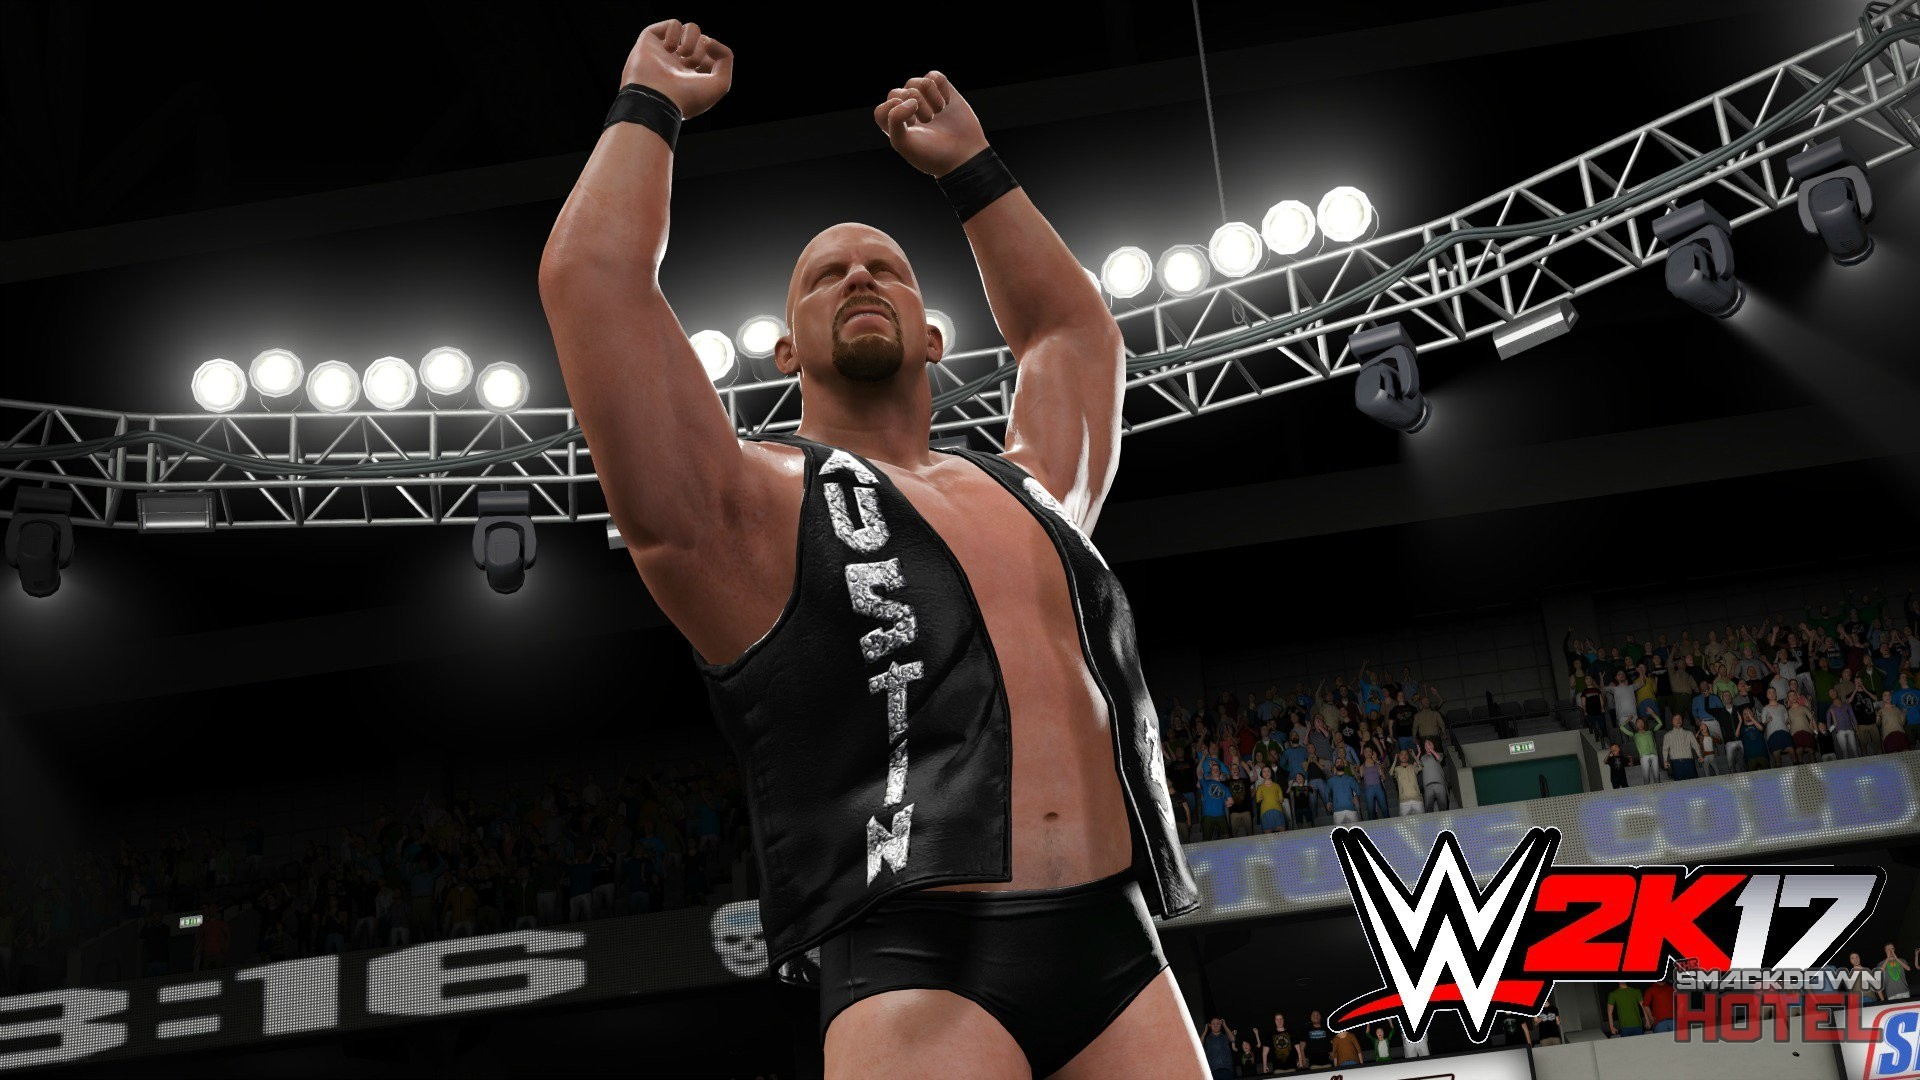 WWE2K17-PC-Austin-Rock10 WWE2K17-StoneCold-SteveAustin …